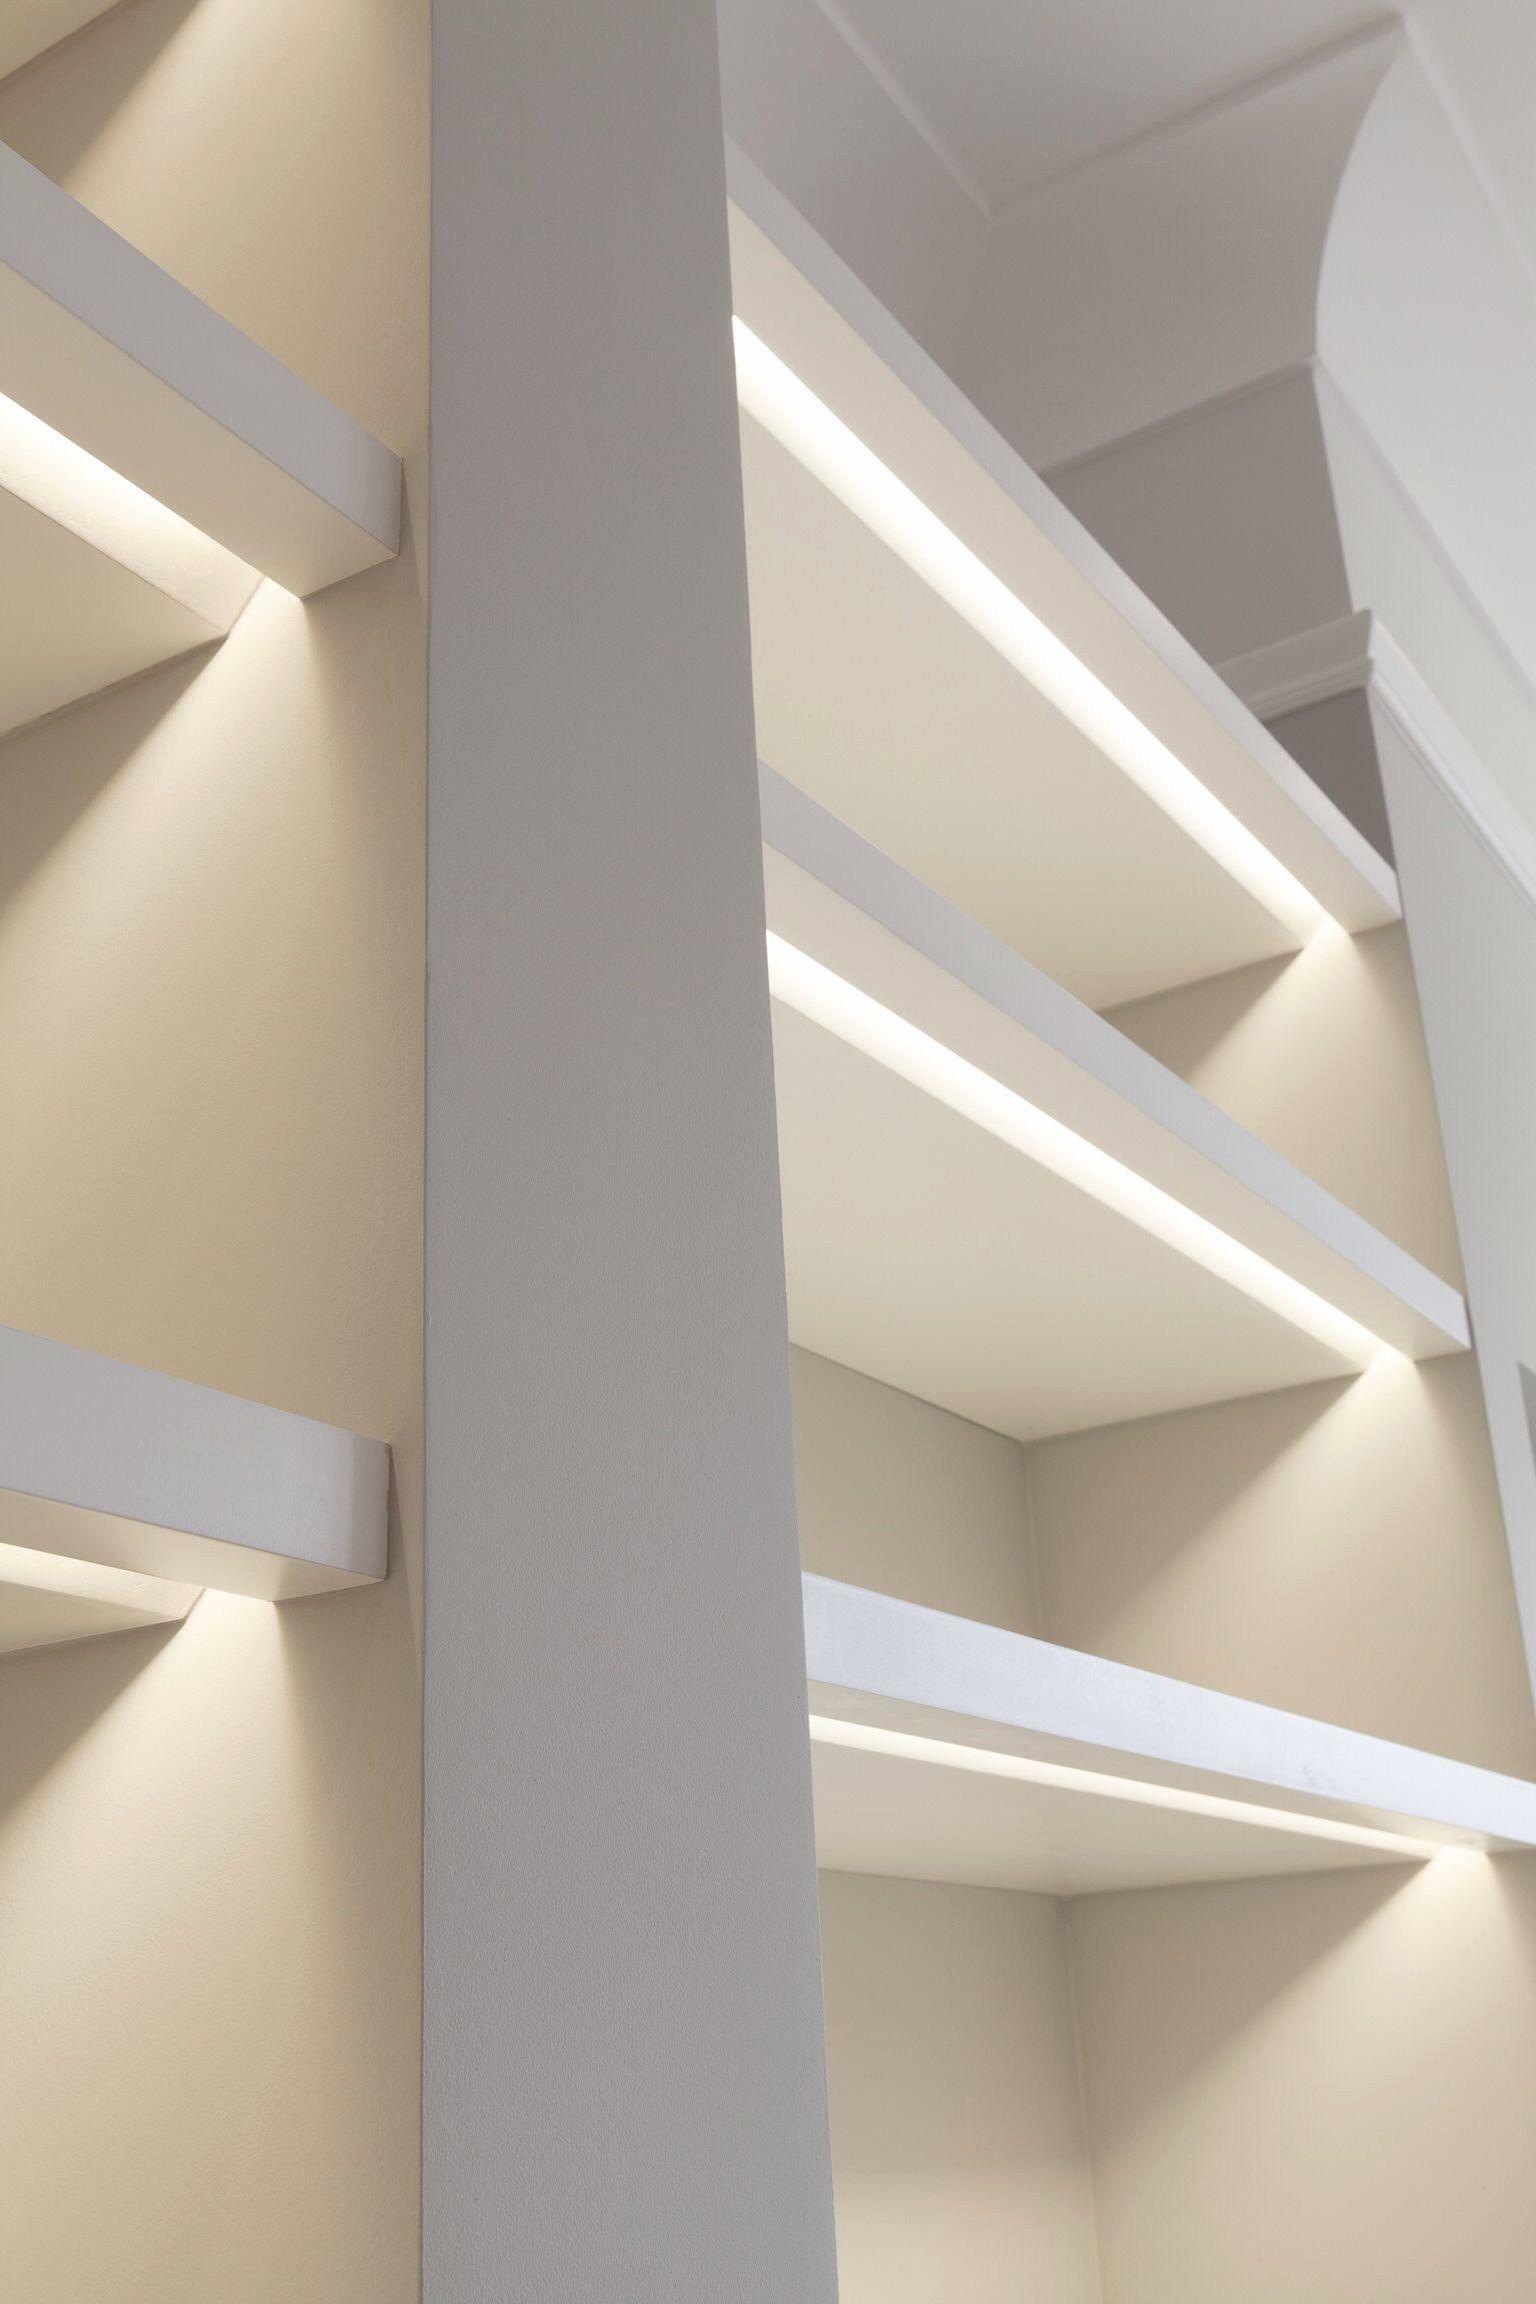 Regal Mit Licht New Edle Lichtelement Mb Light It Up Pinterest Design Fur Regal Mit Schreibtischplat Innenbeleuchtung Beleuchtung Fur Zuhause Seitenbeleuchtung